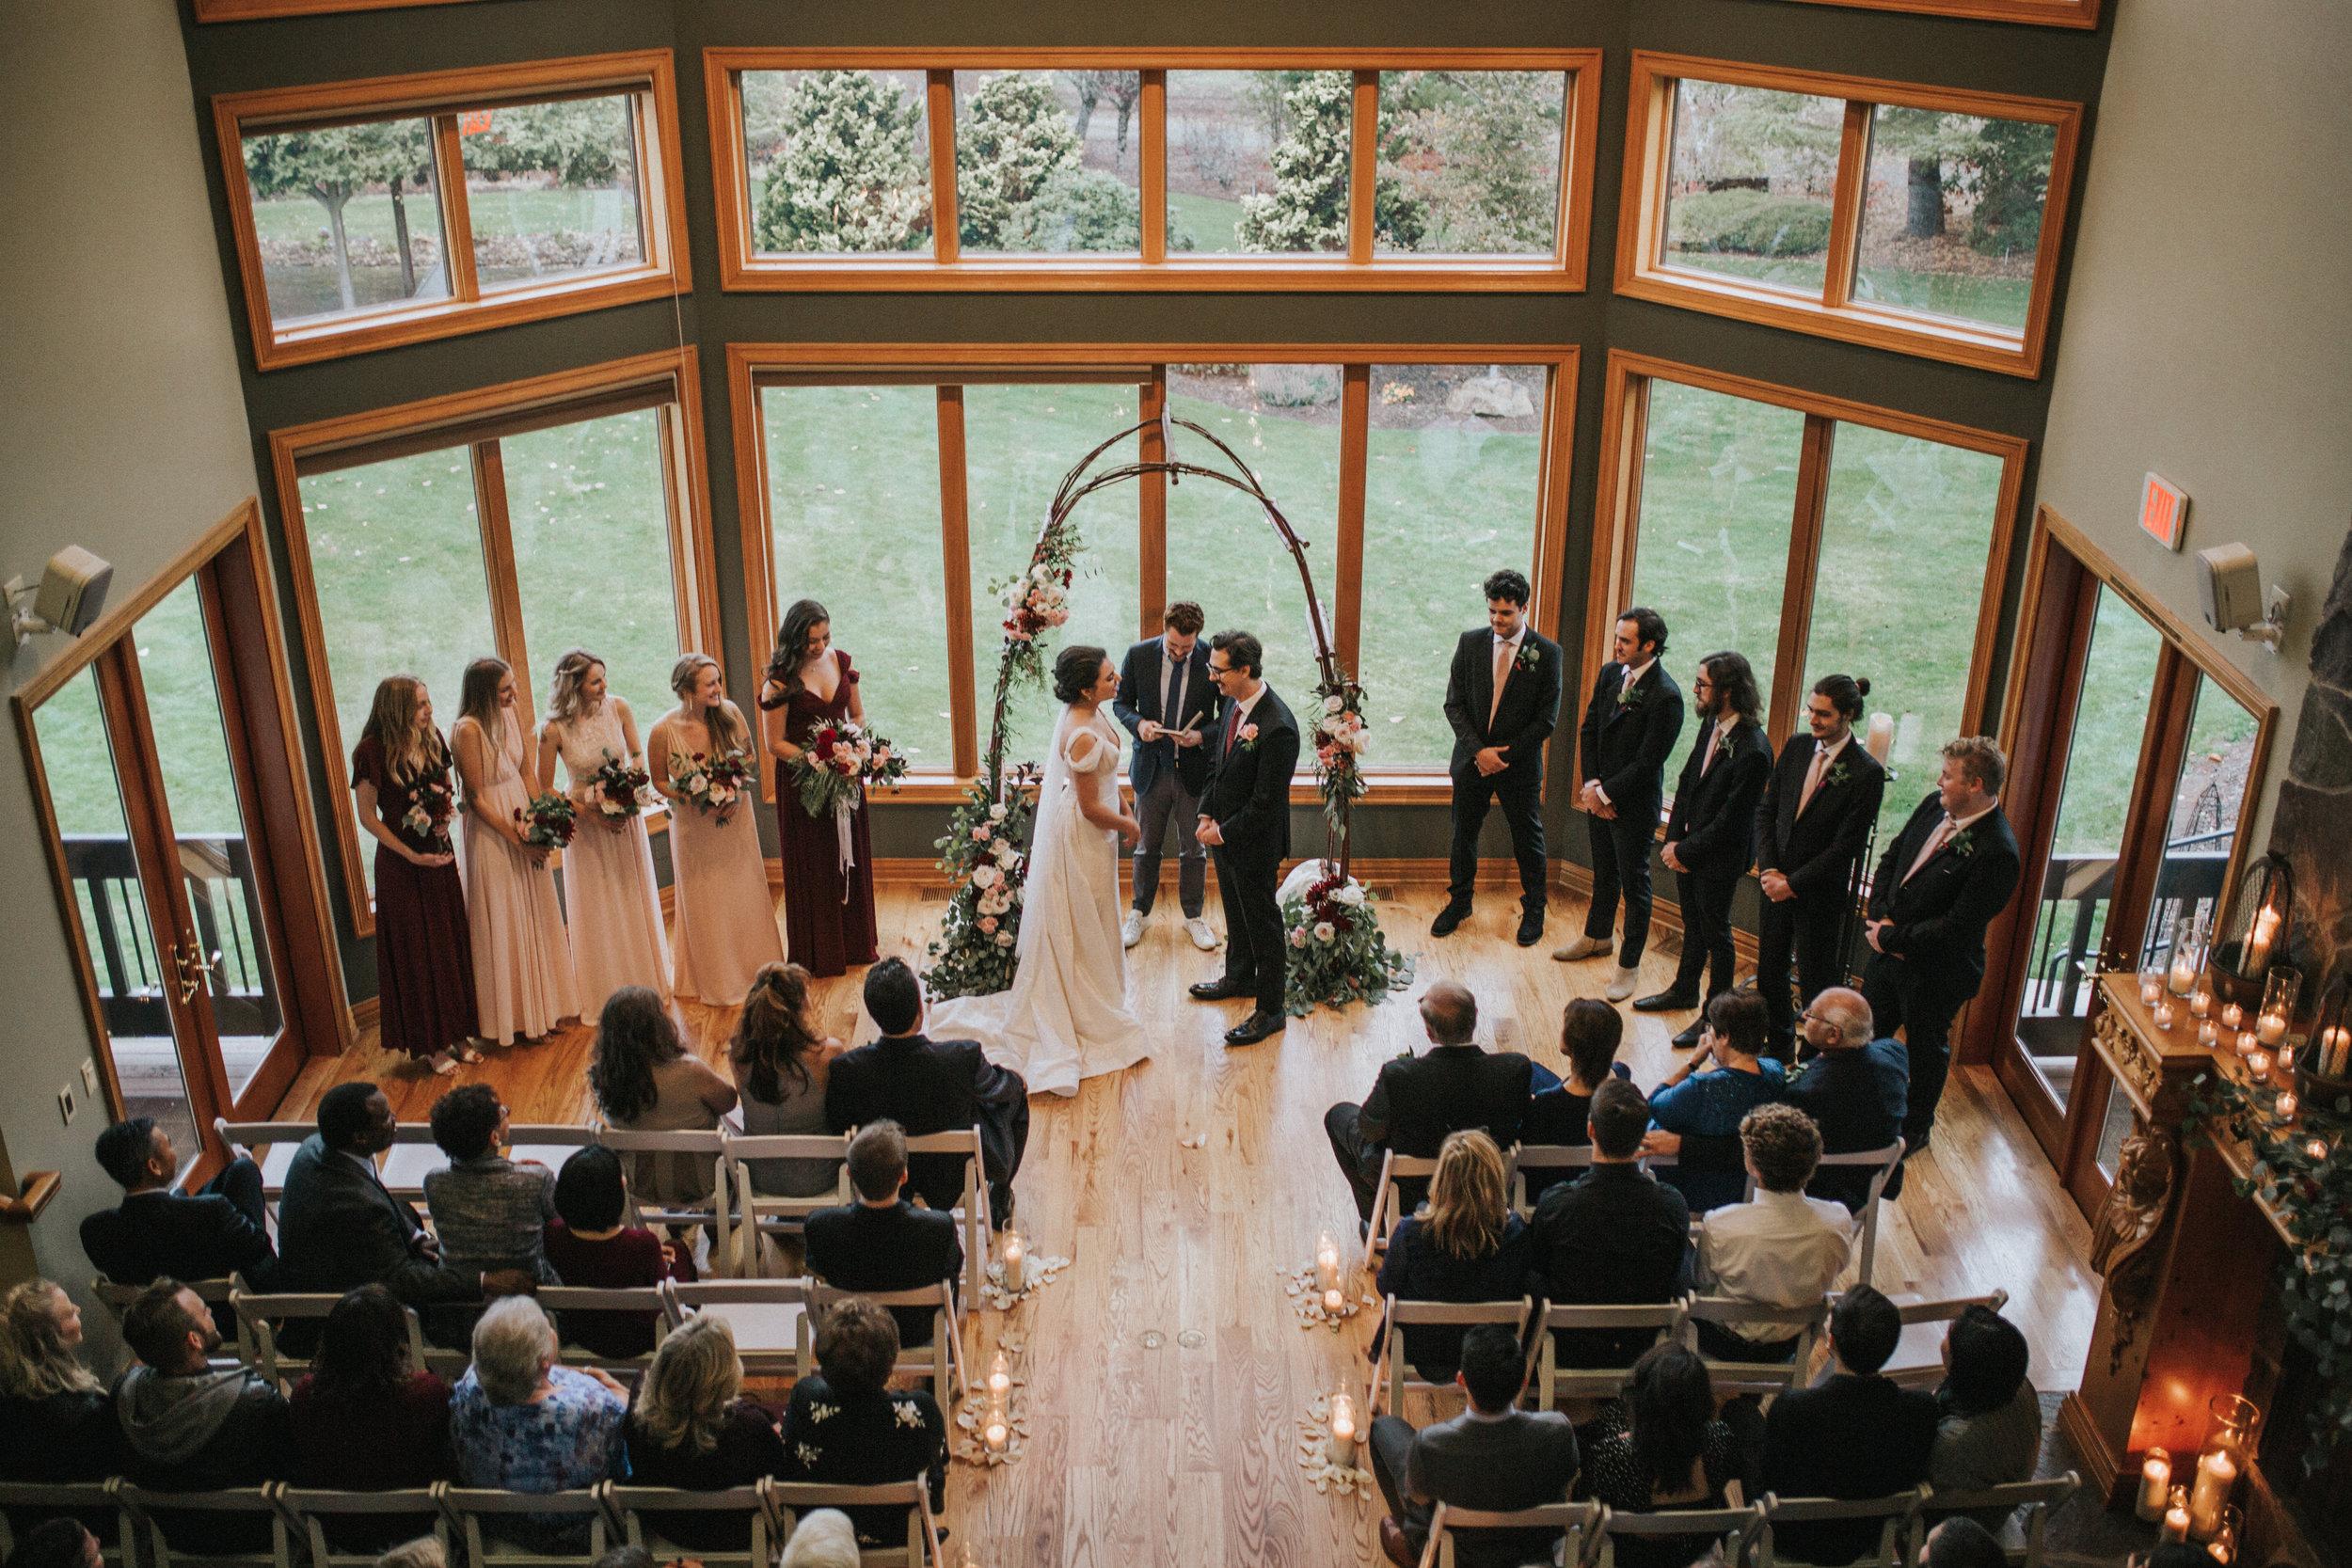 Alex + Nat's Wonser Woods Estates Wedding - See More